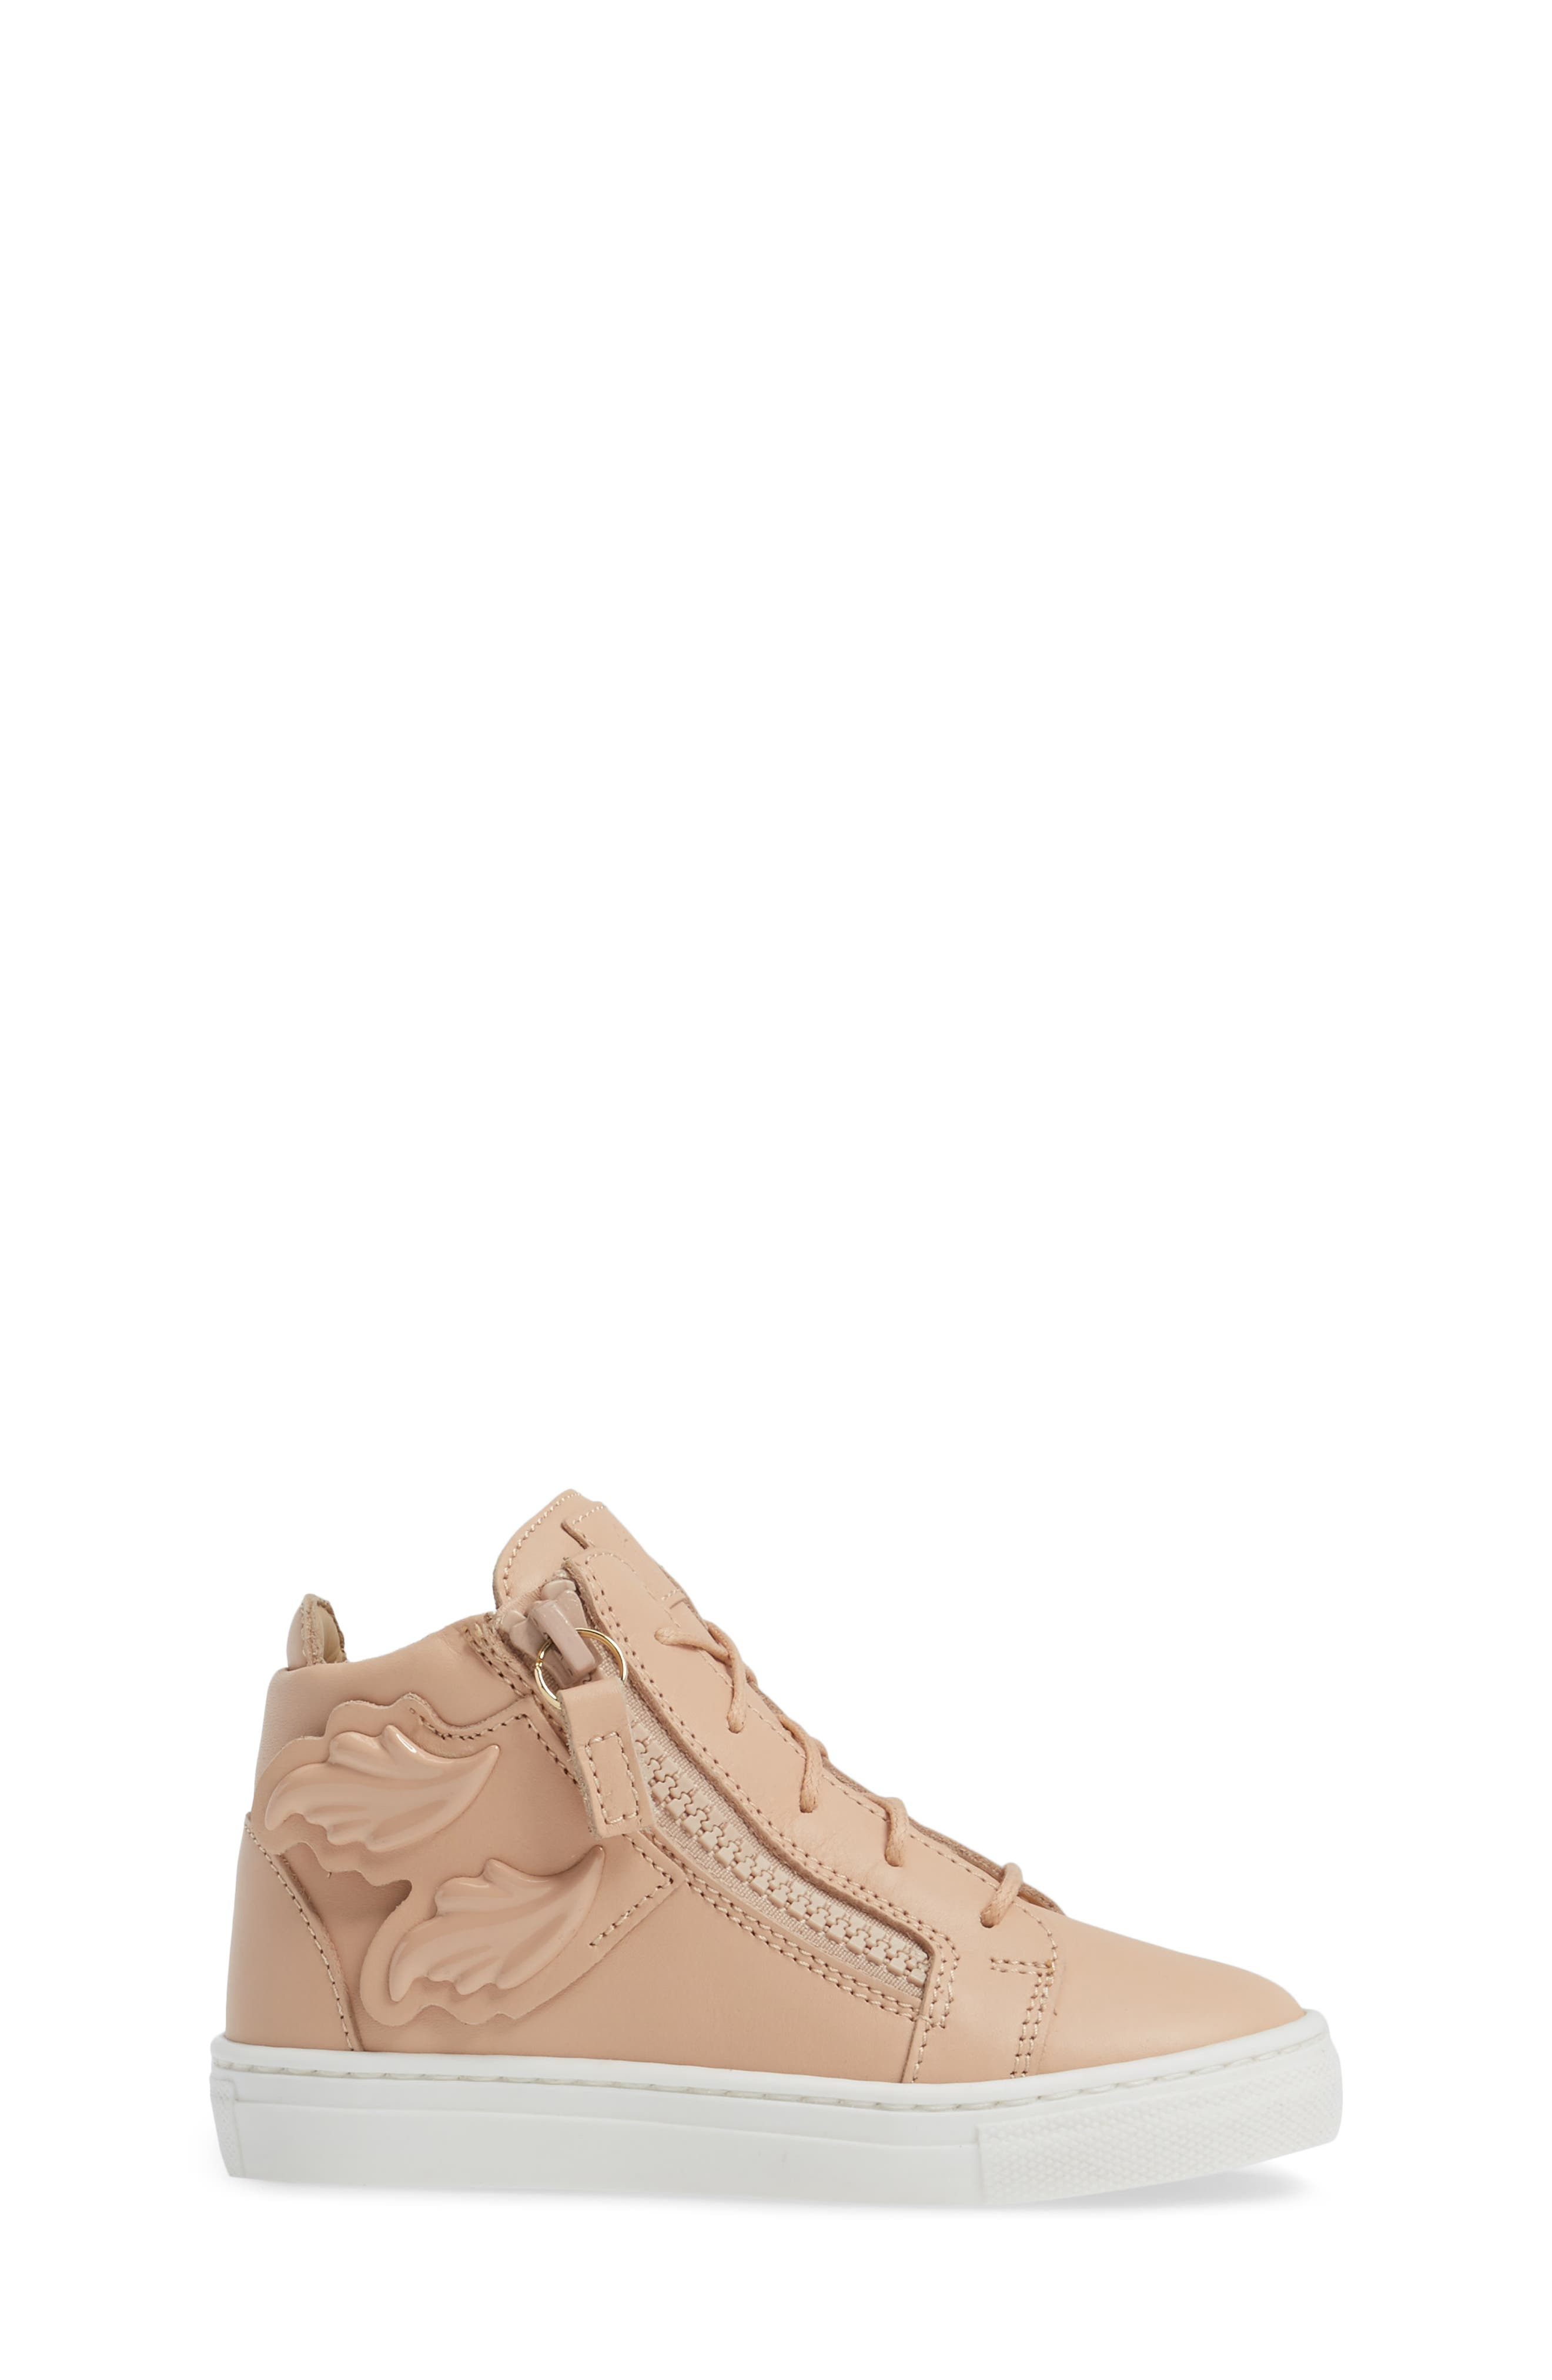 Foglia Embellished Zip Sneaker,                             Alternate thumbnail 3, color,                             Shell Leather